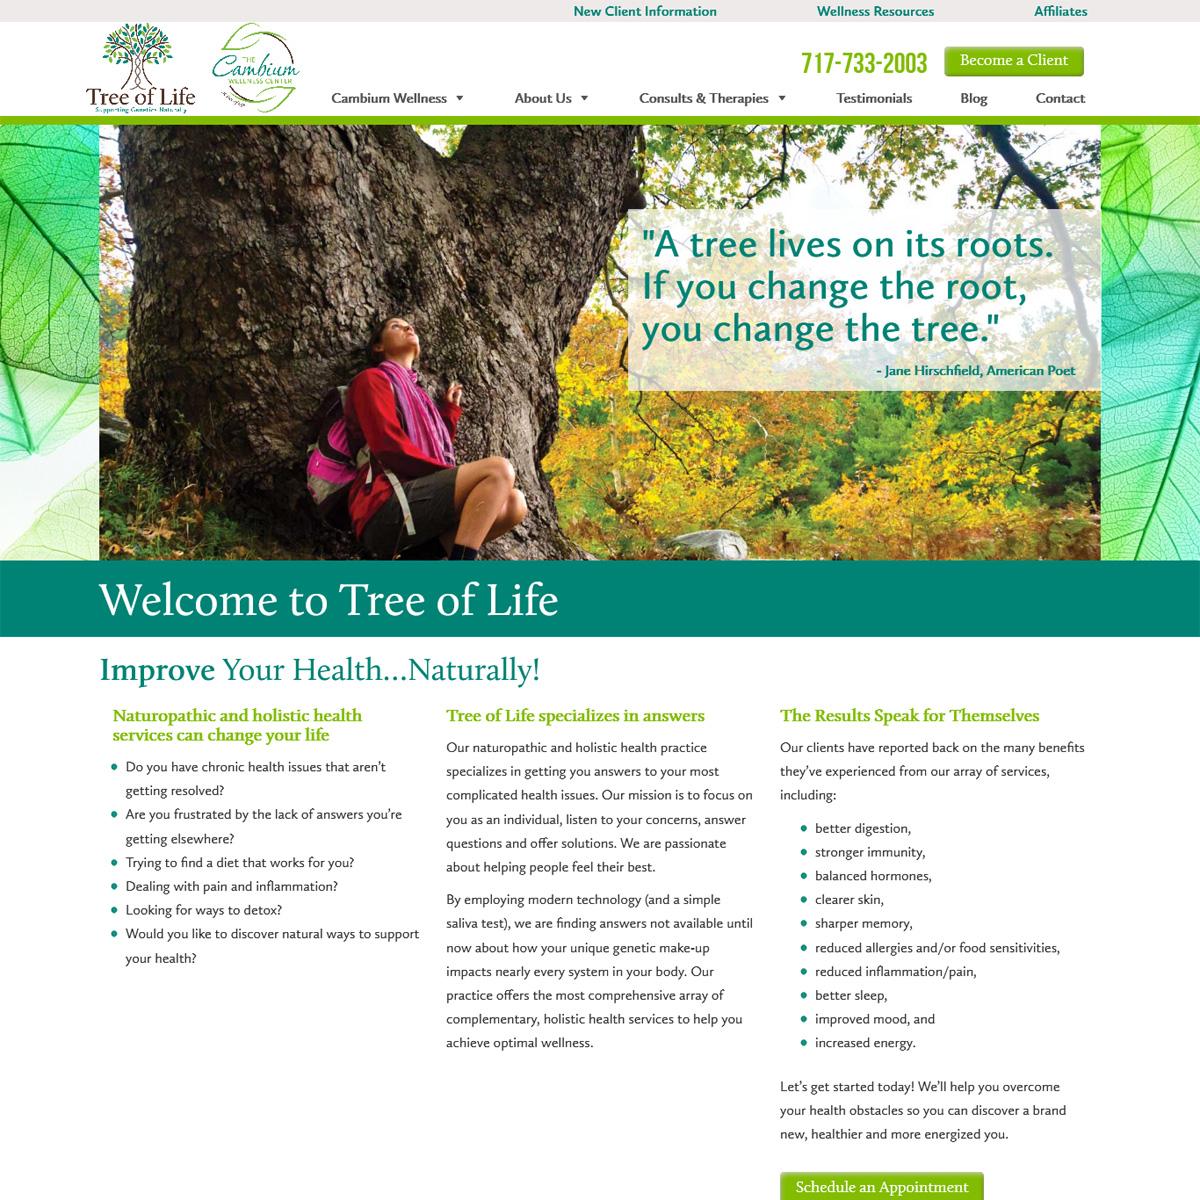 Tree of Life Website Design